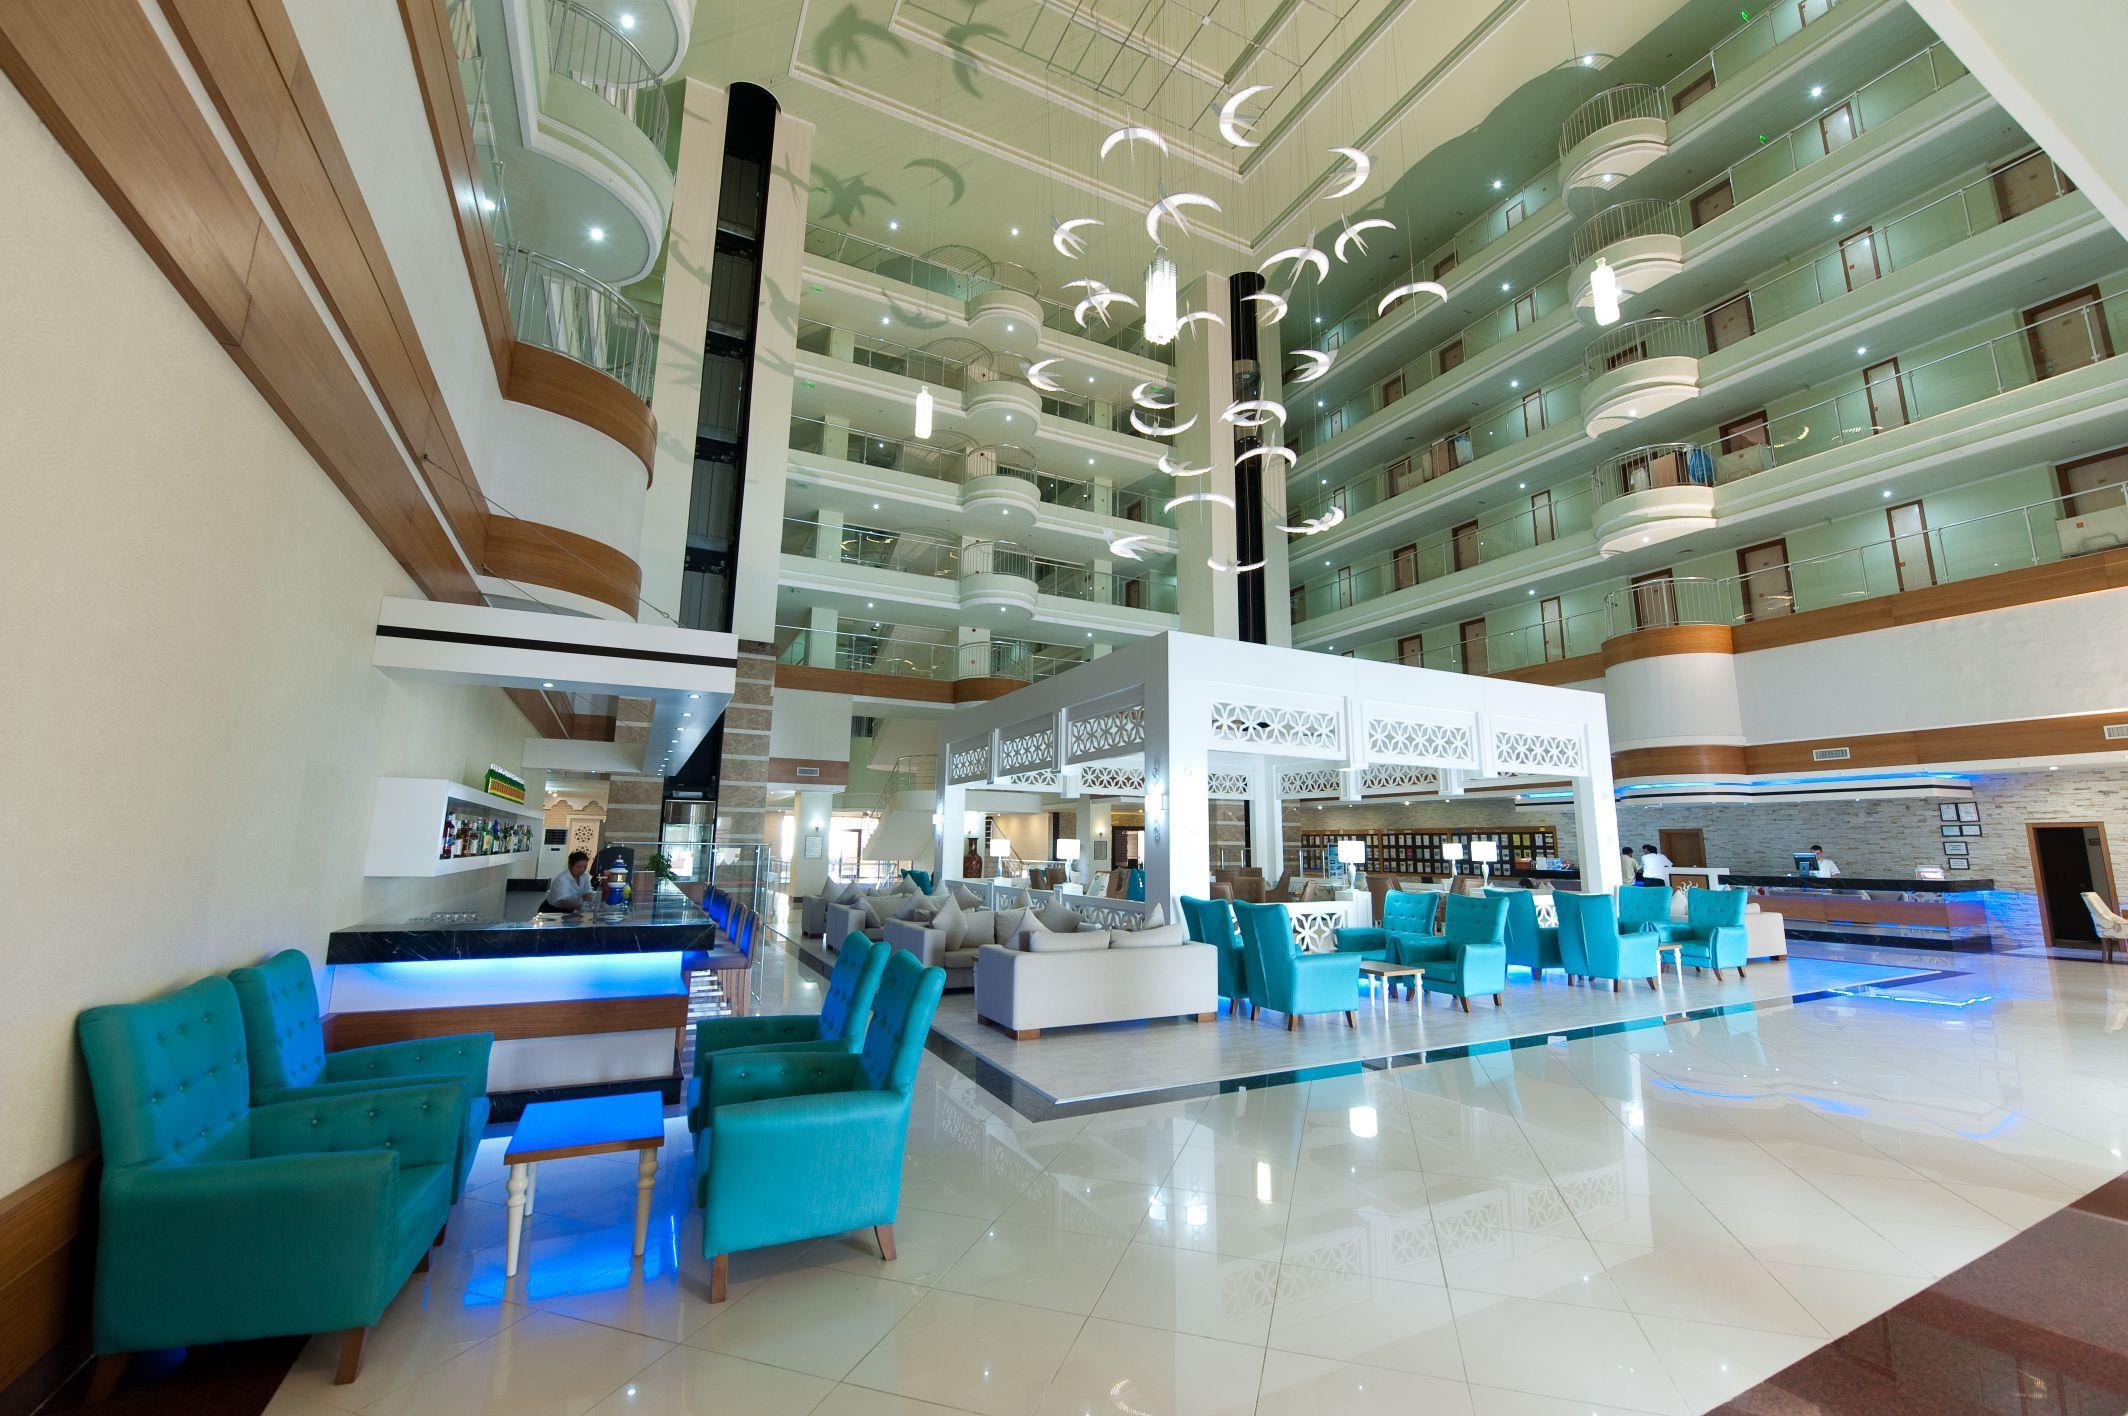 http://www.orextravel.sk/OREX/hotelphotos/stella-beach-hotel-alanya-general-0016.jpg